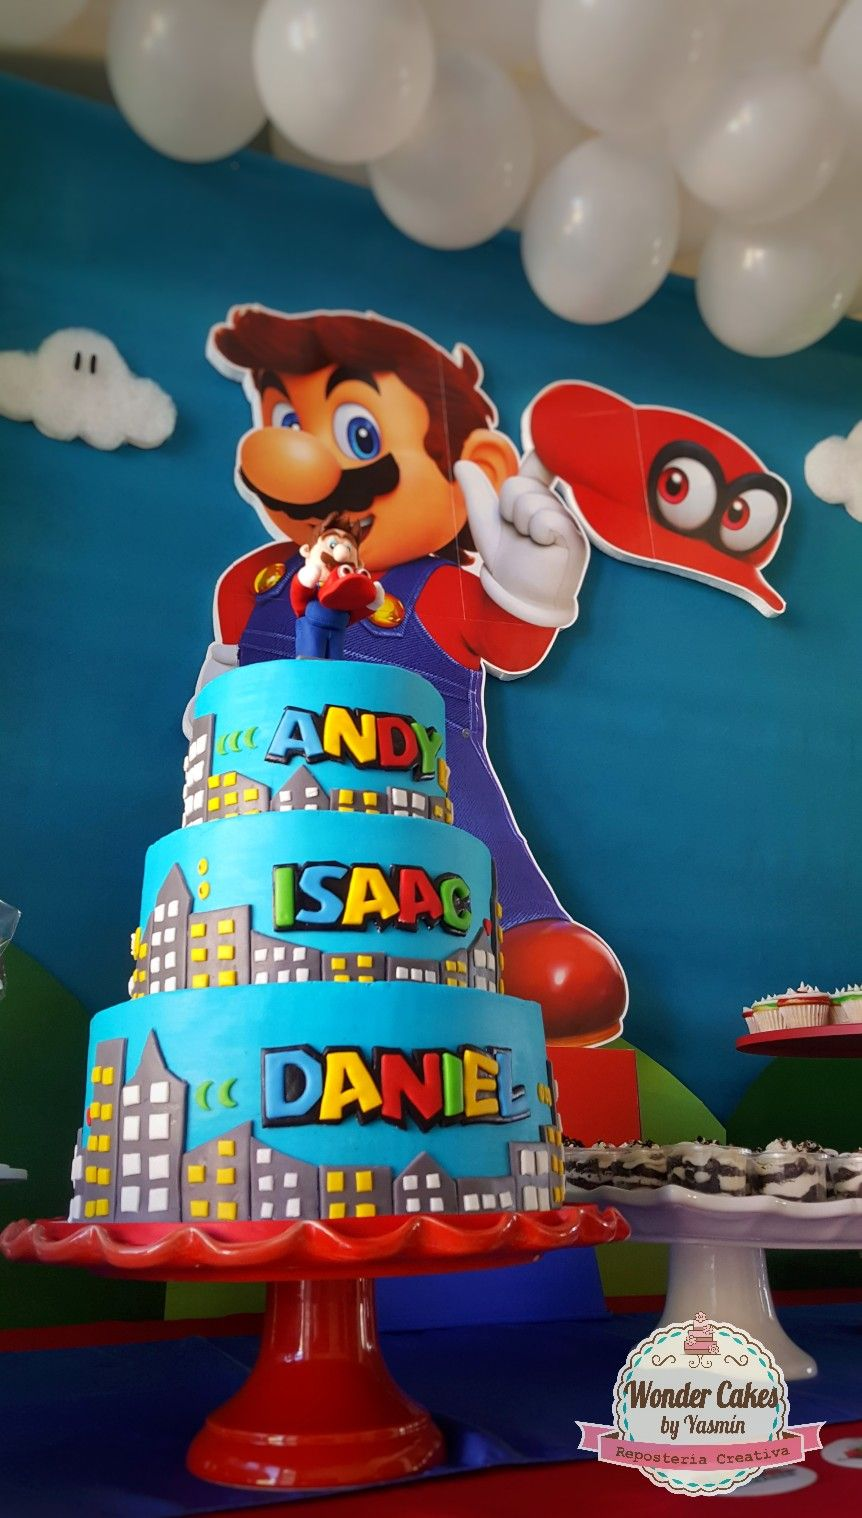 Mario Odyssey Party Metro Kingdom Cake Fondant Decorations Over